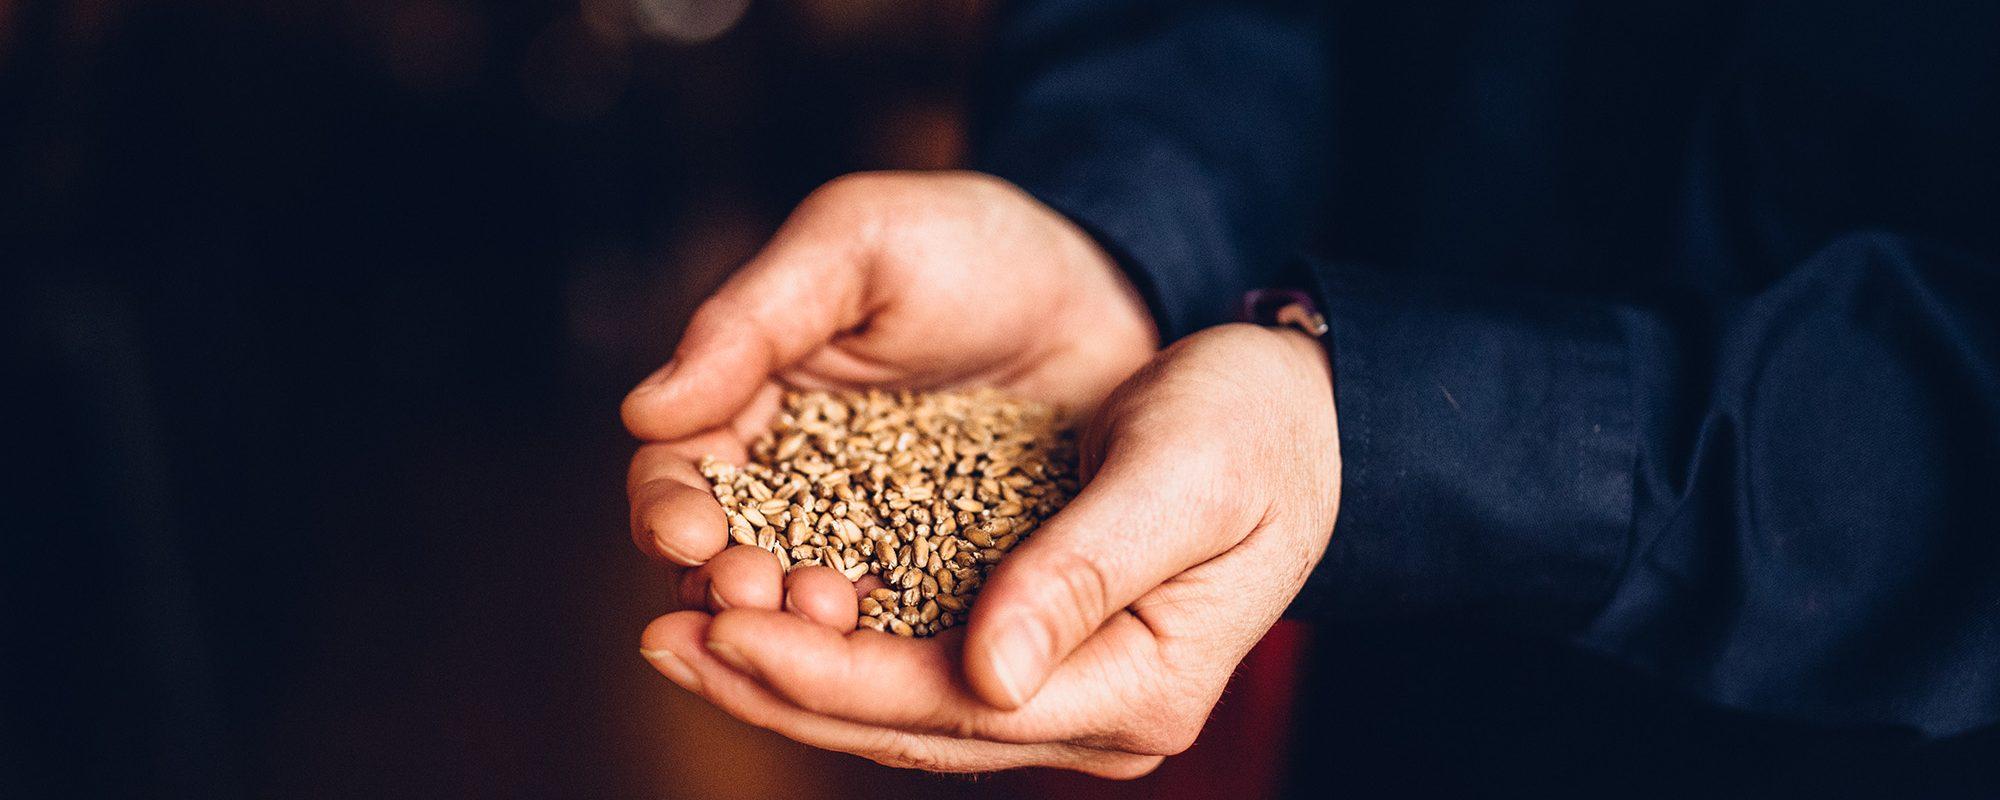 Nicole holding grains